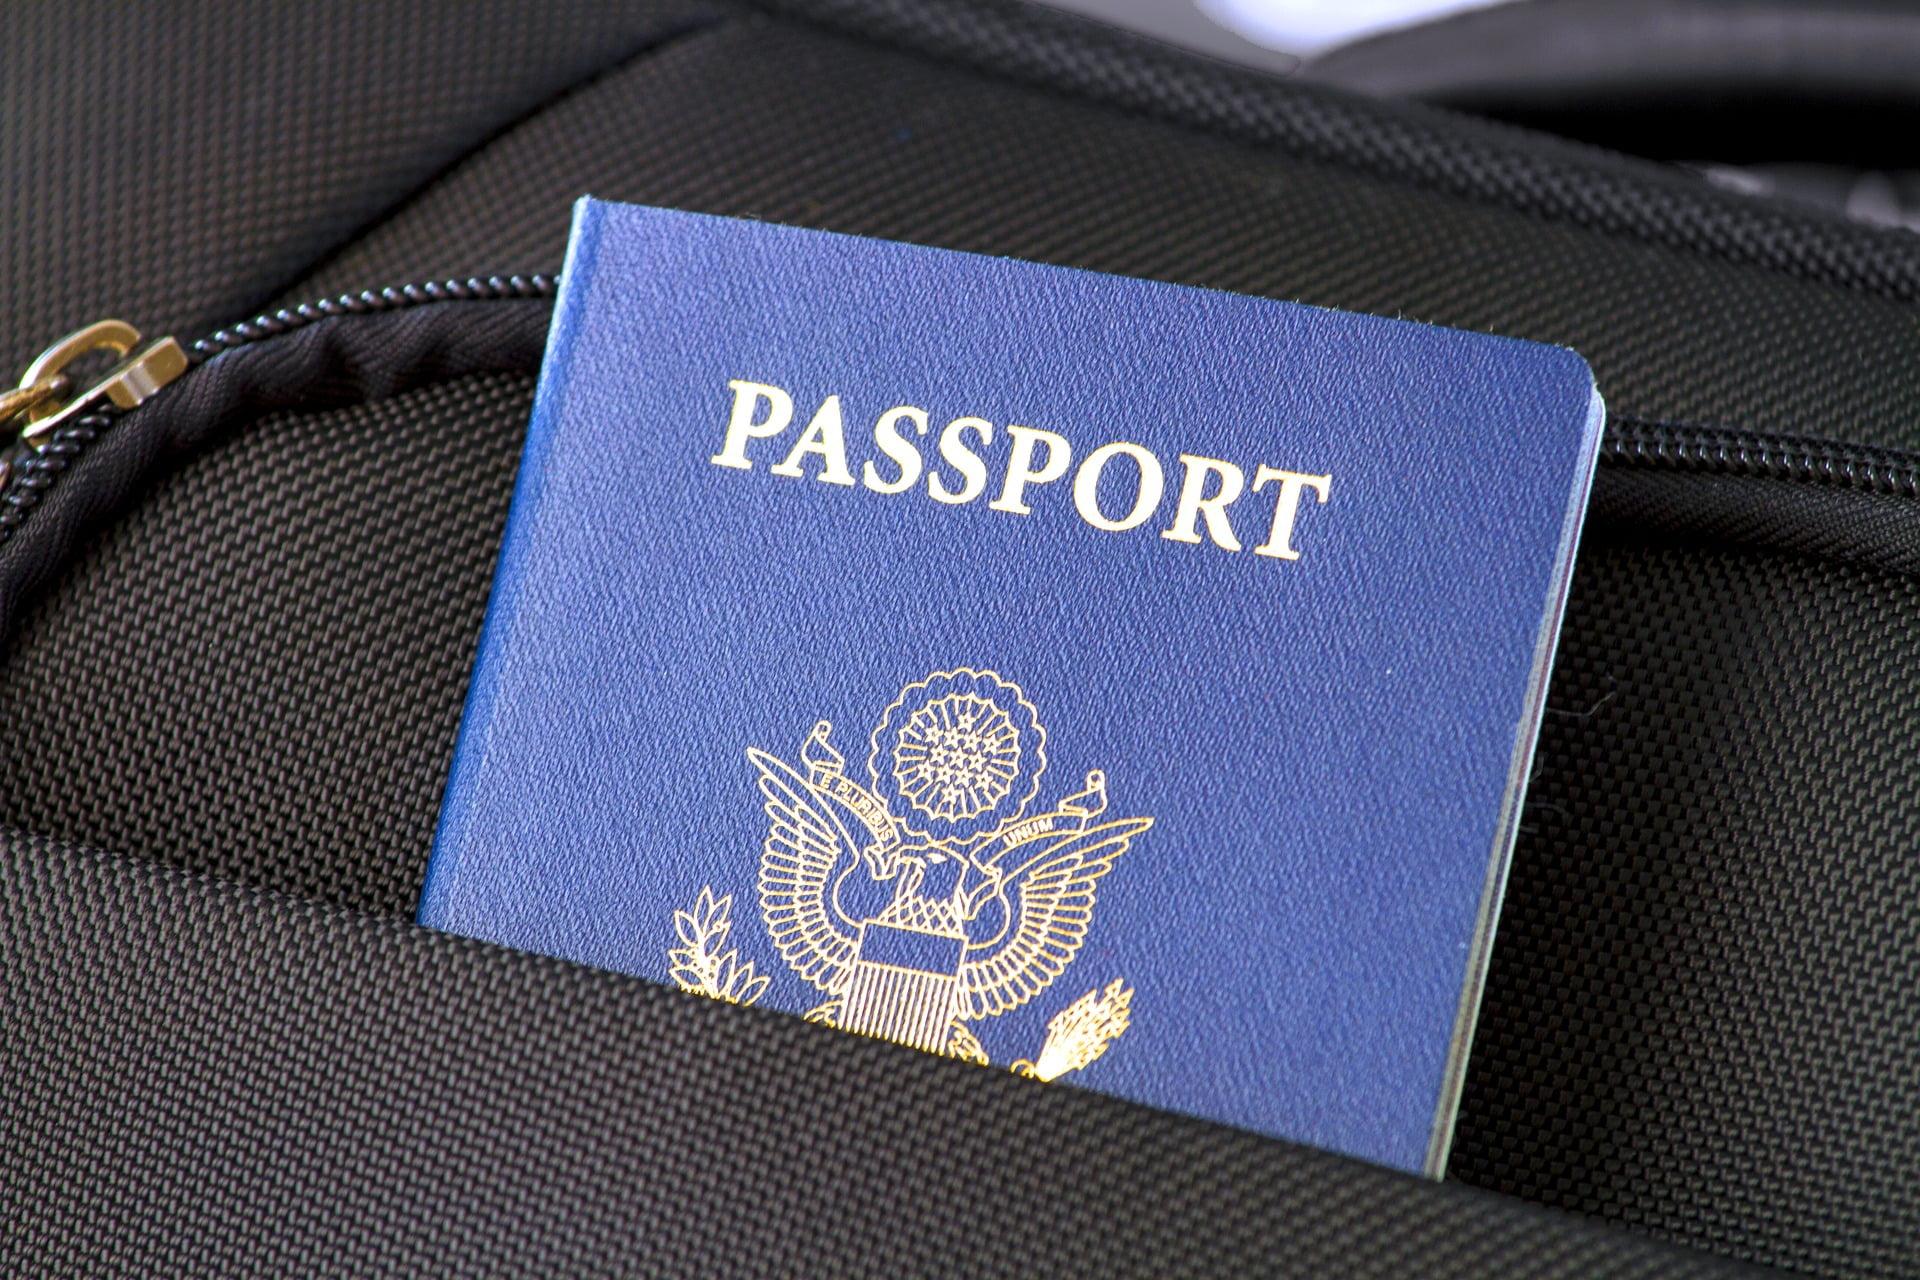 Загранпаспорт нового образца готовность загранпаспорта